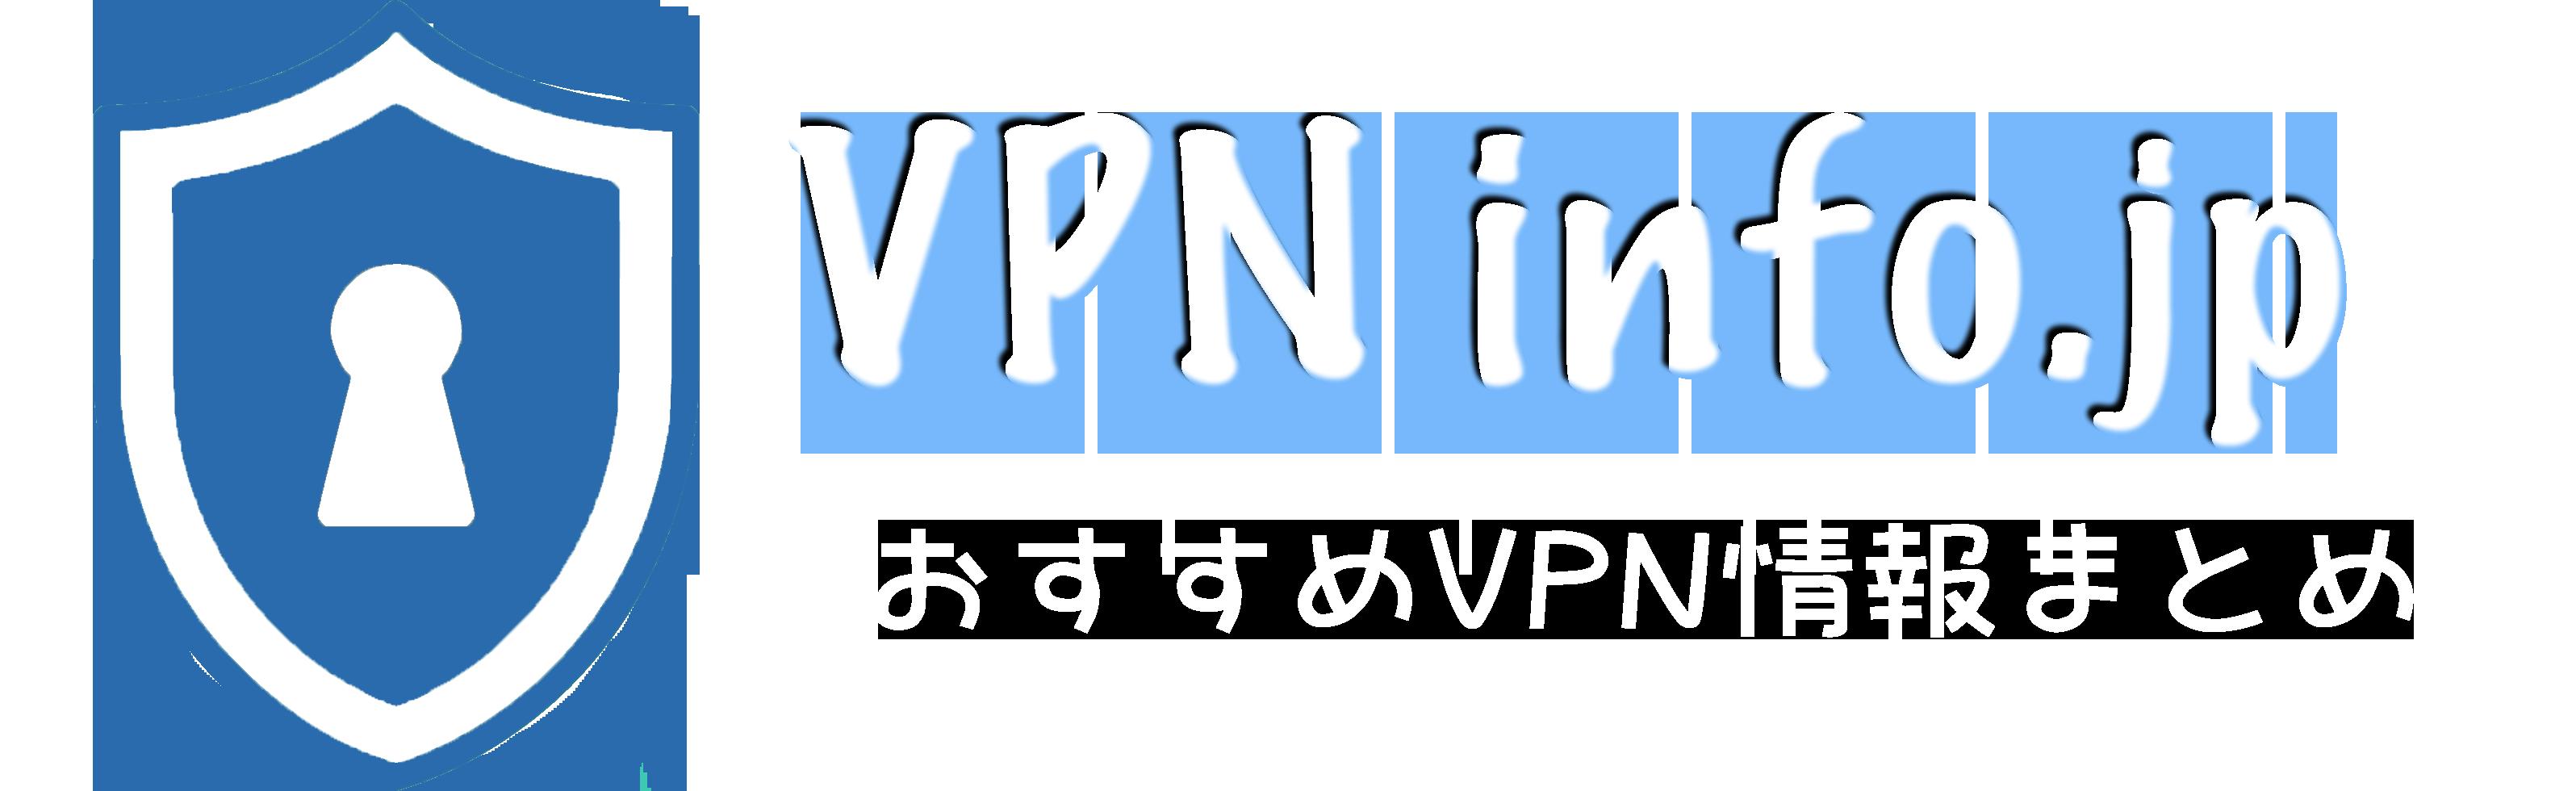 VPN info.jp